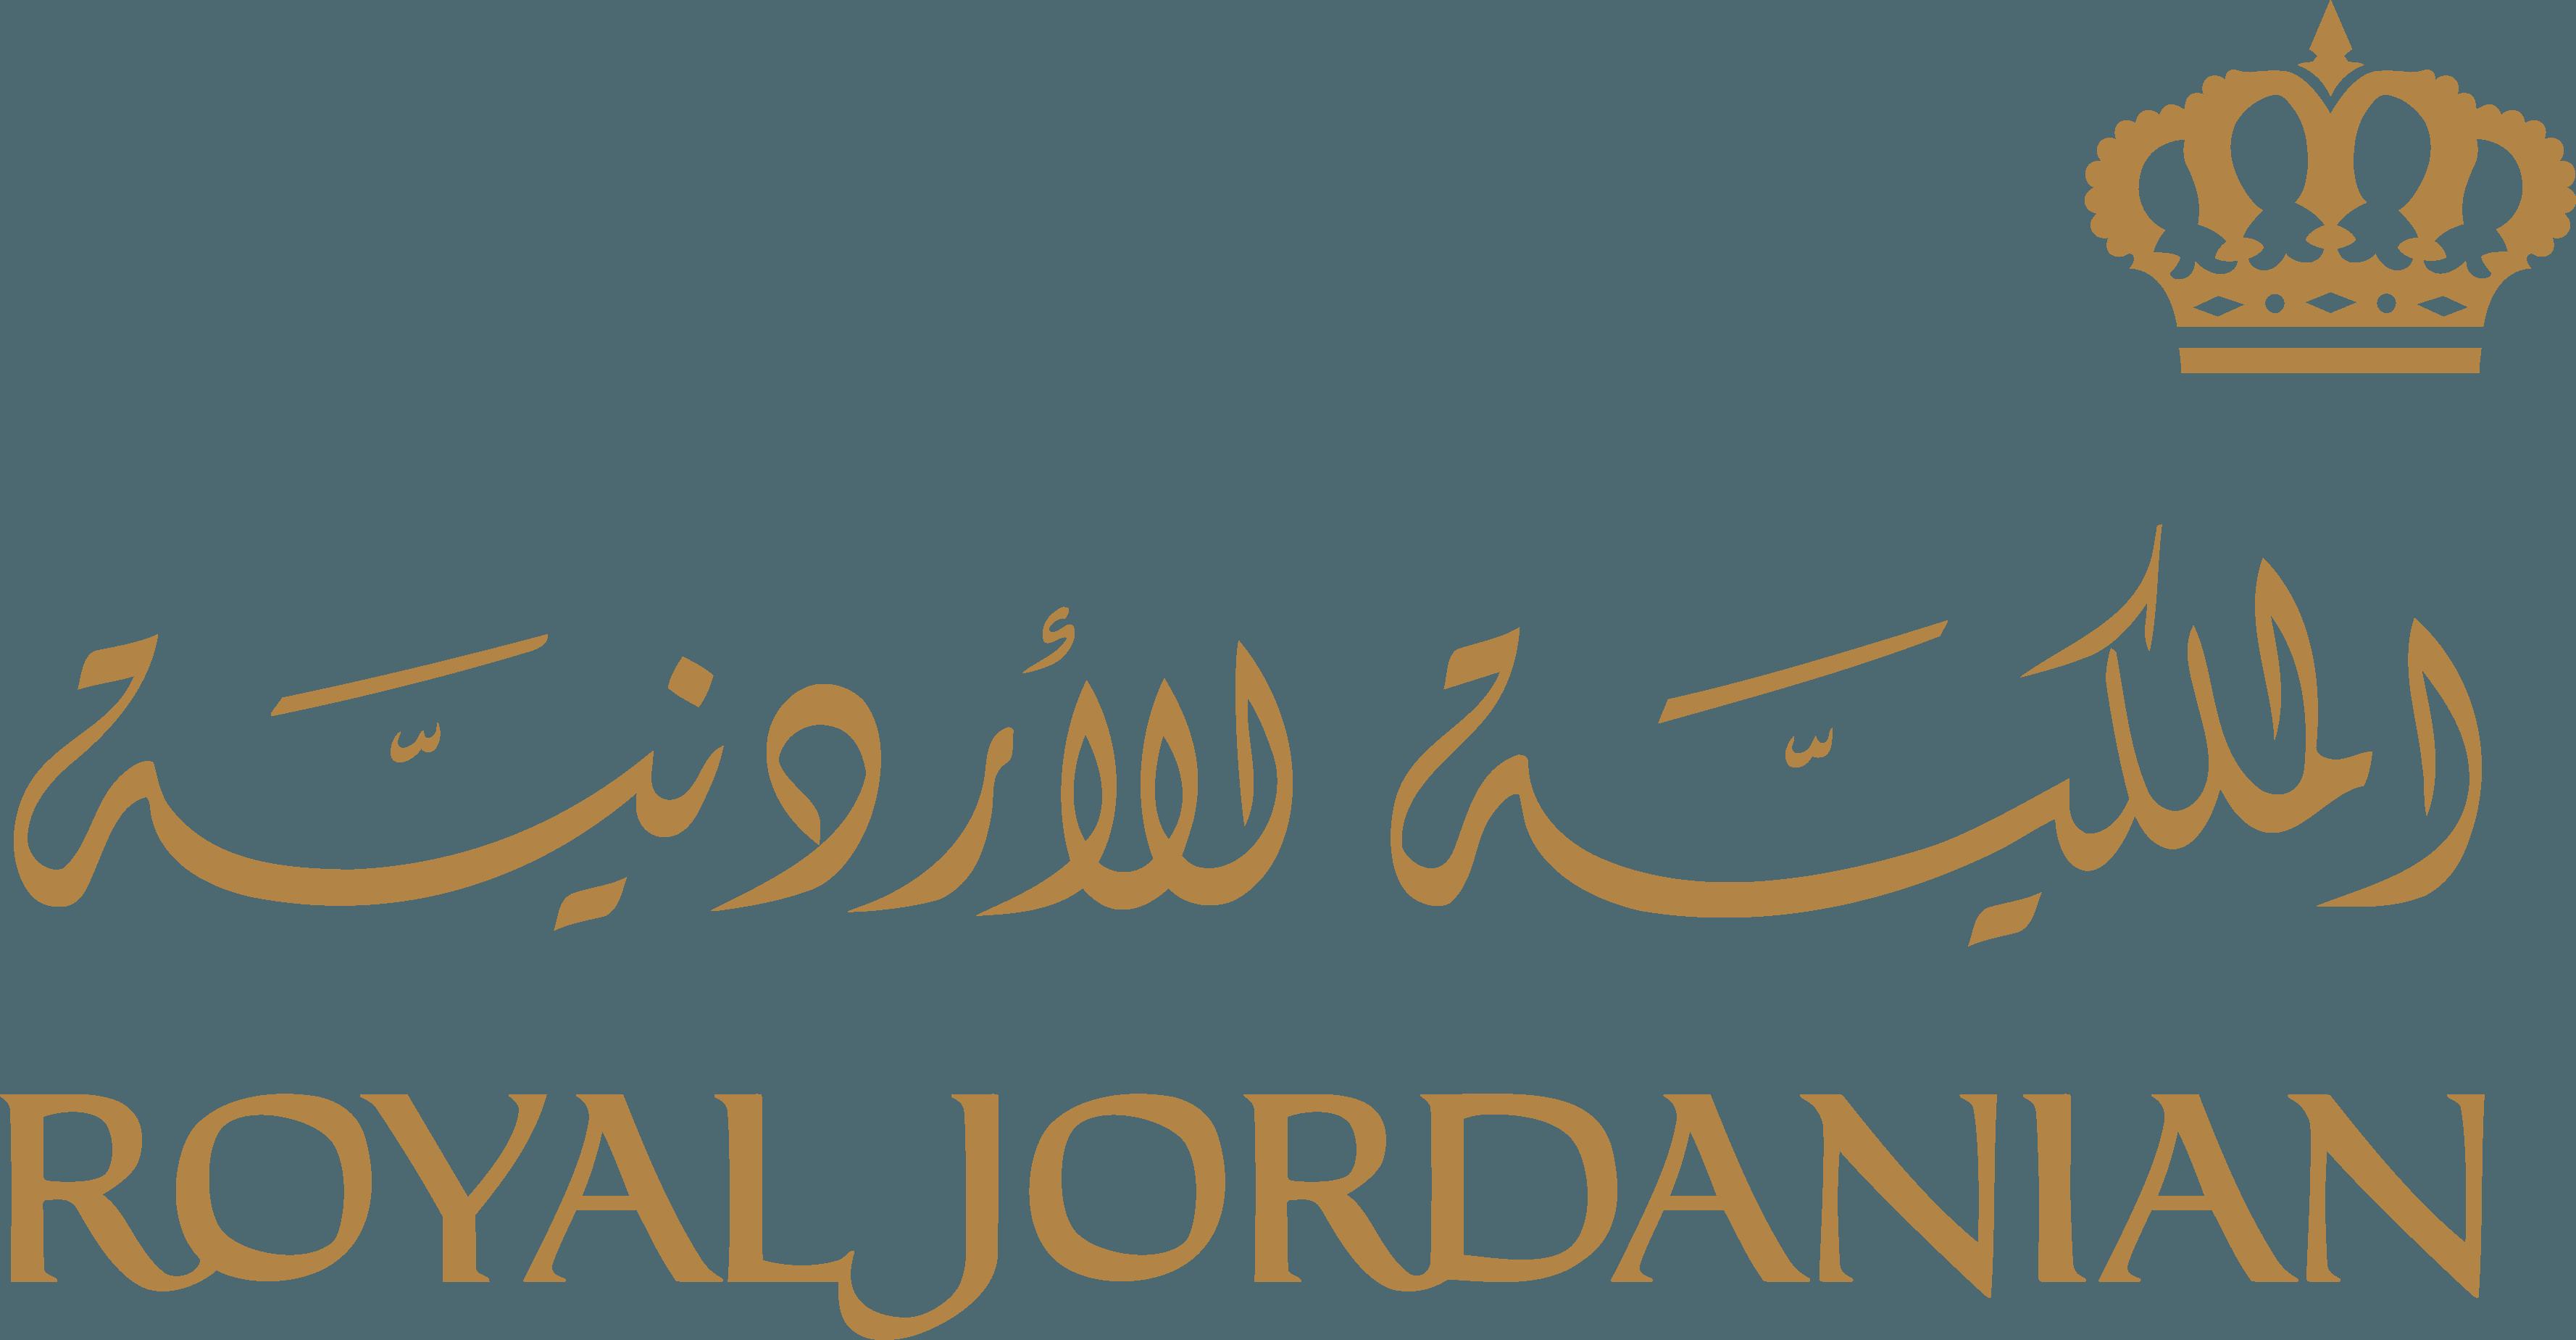 Royal Jordanian Airlines Logo [rj.com] png